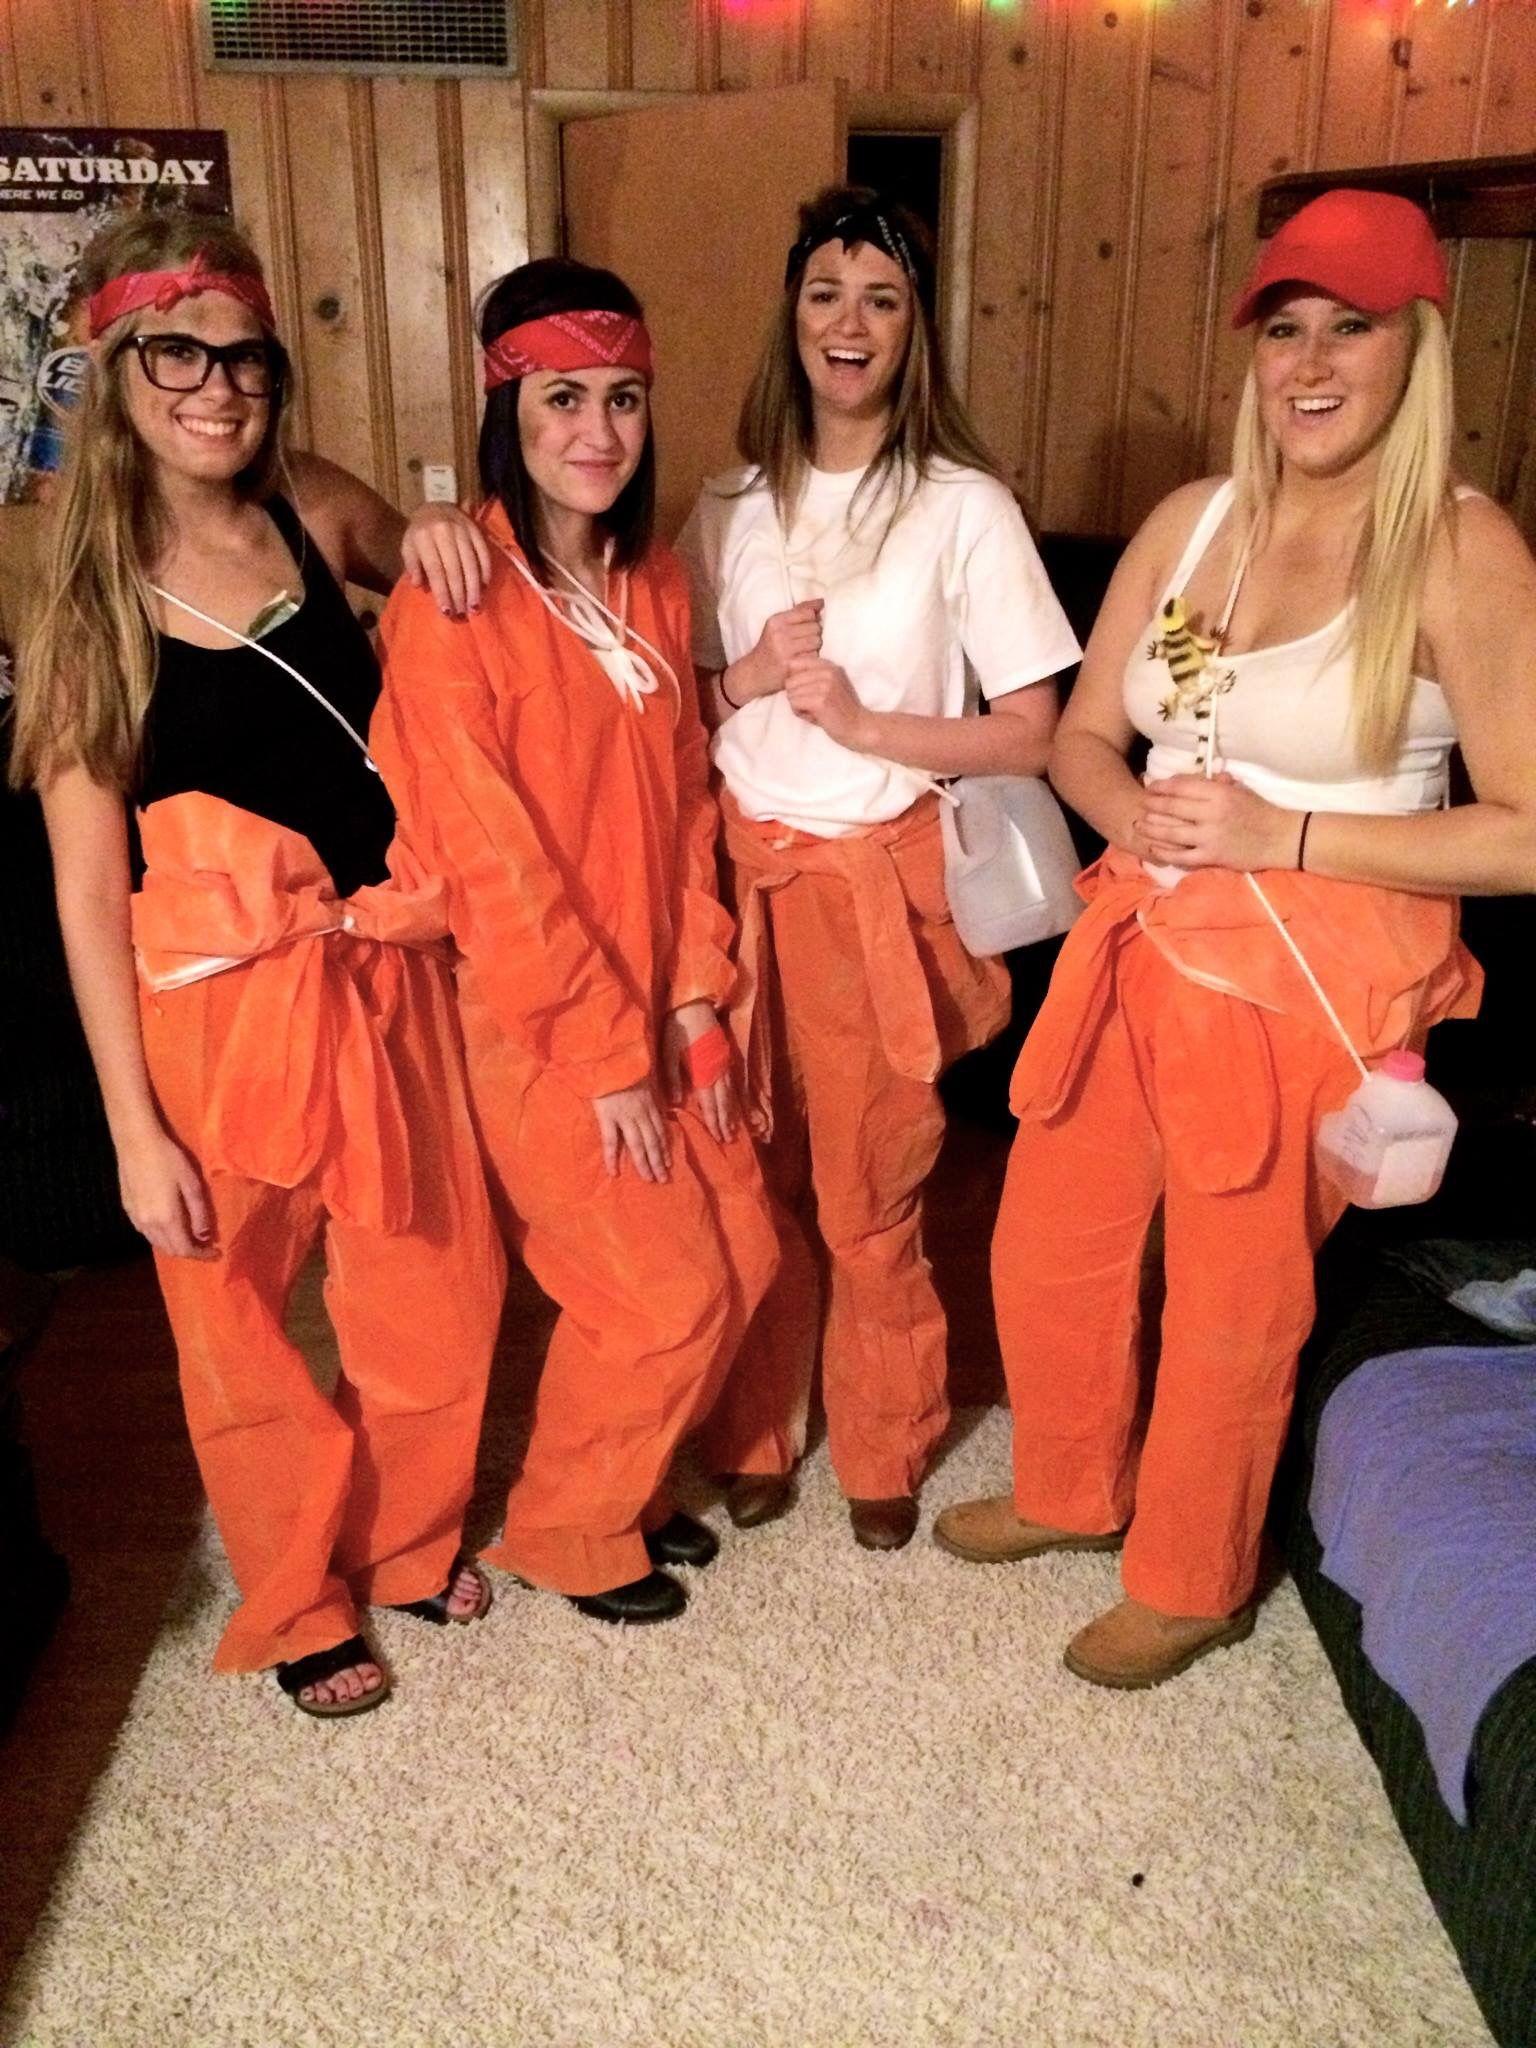 Funny group halloween costume funny halloween costume